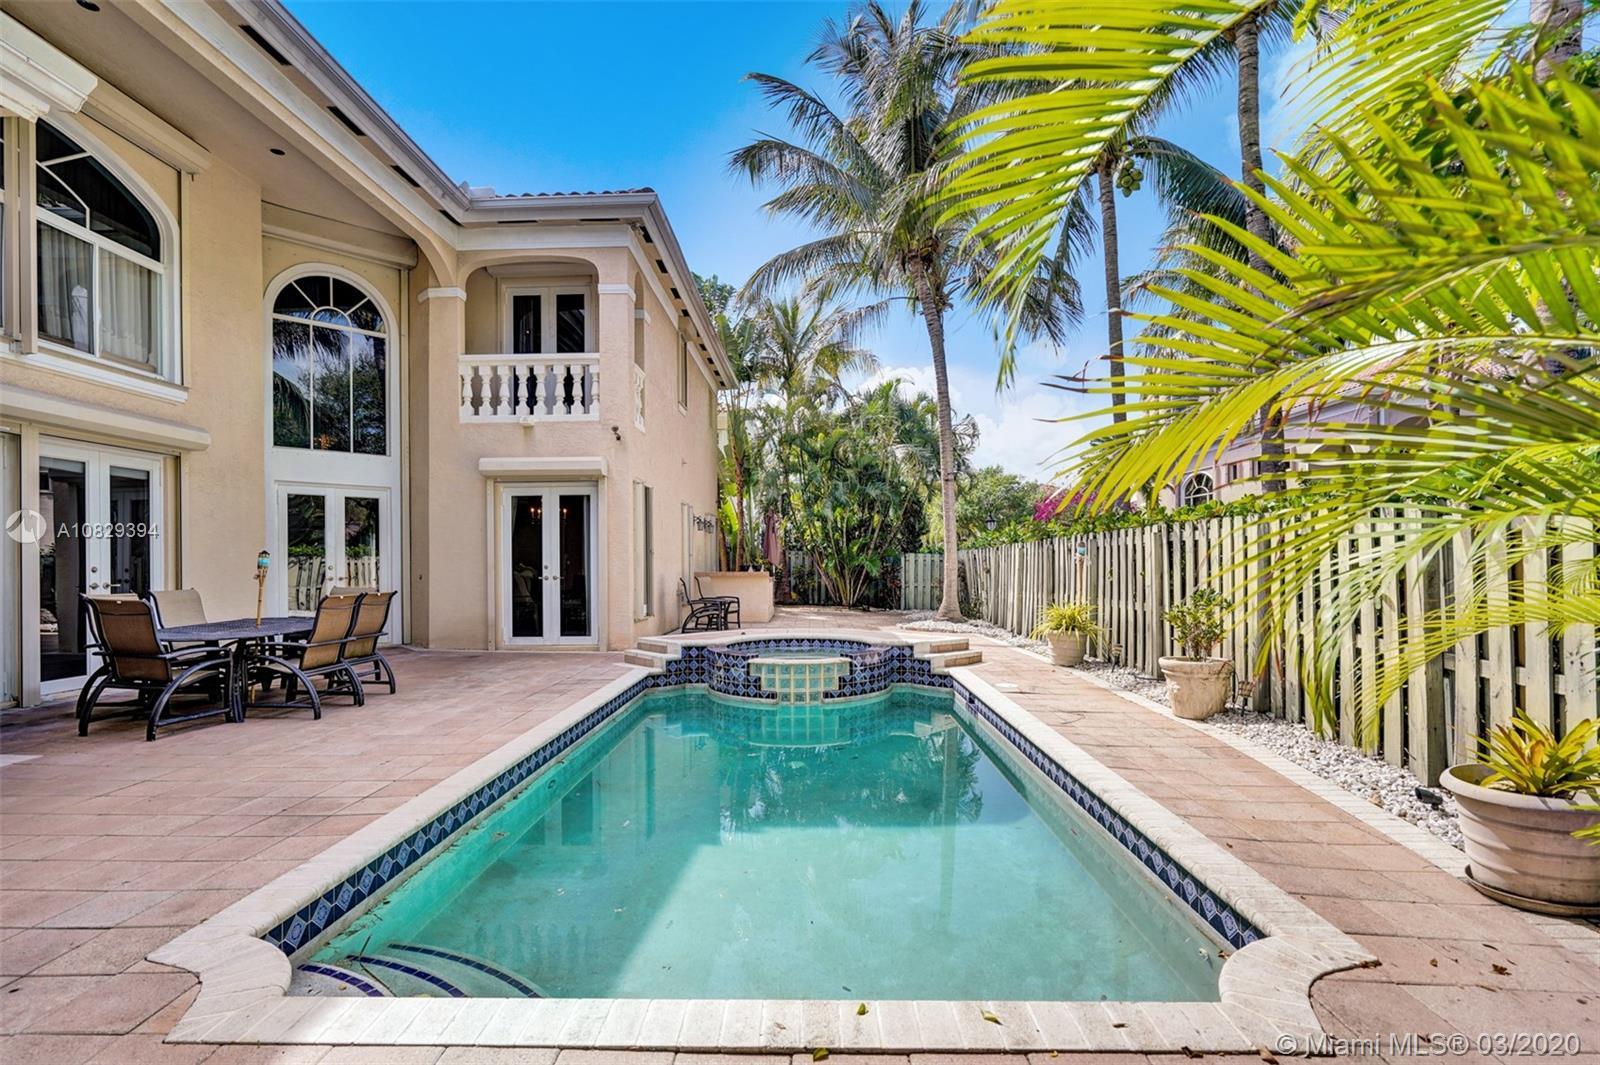 Courtyard Home Pool